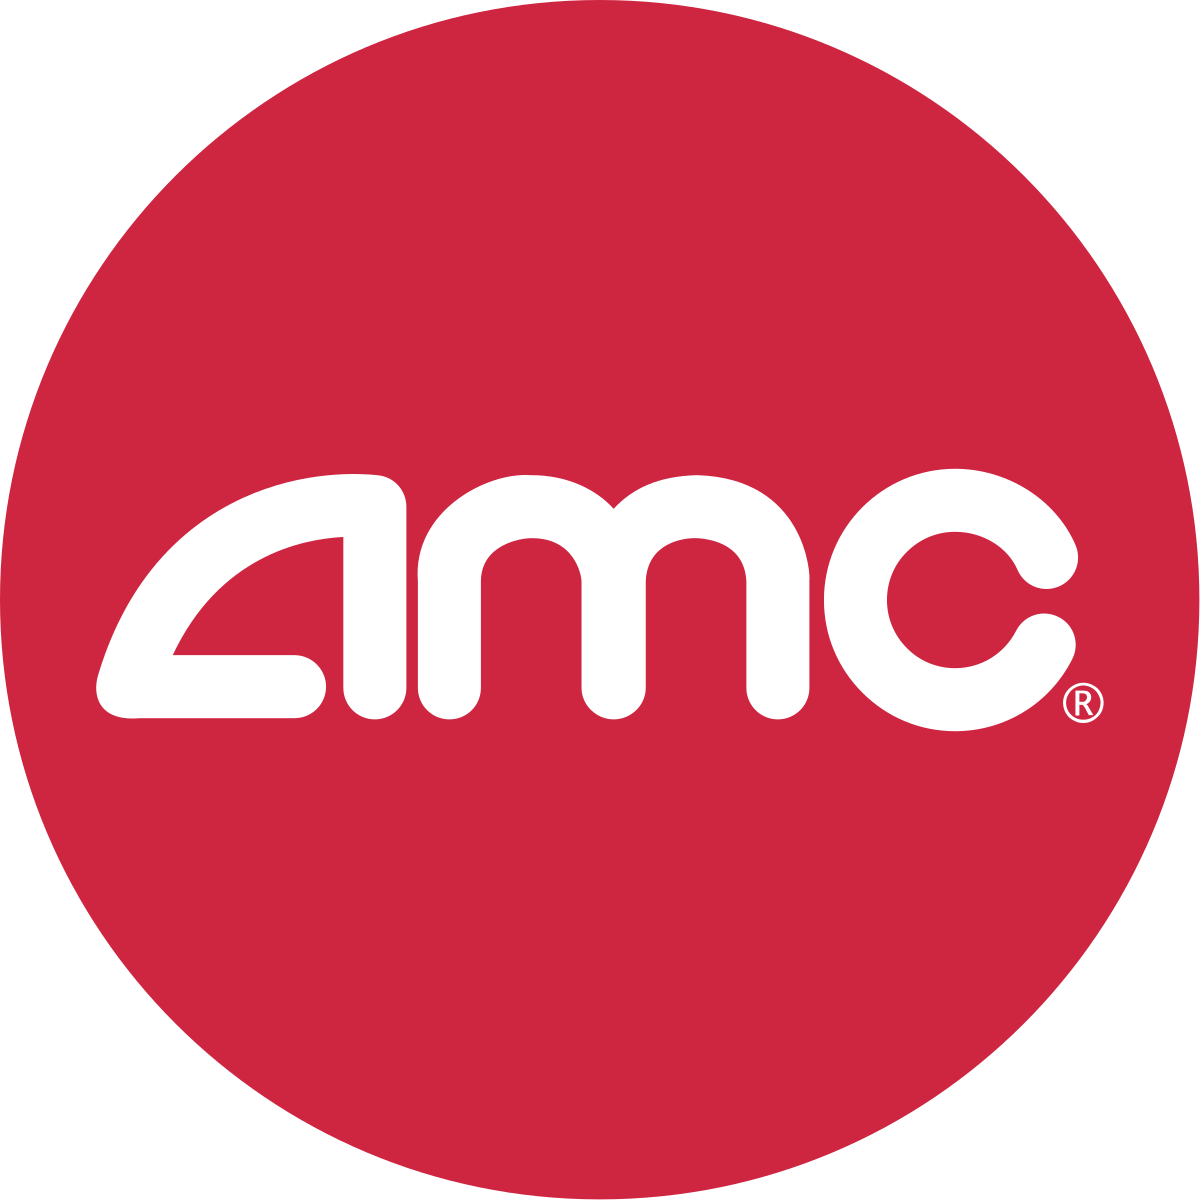 AMC Theatres Logo - https://www.amctheatres.com